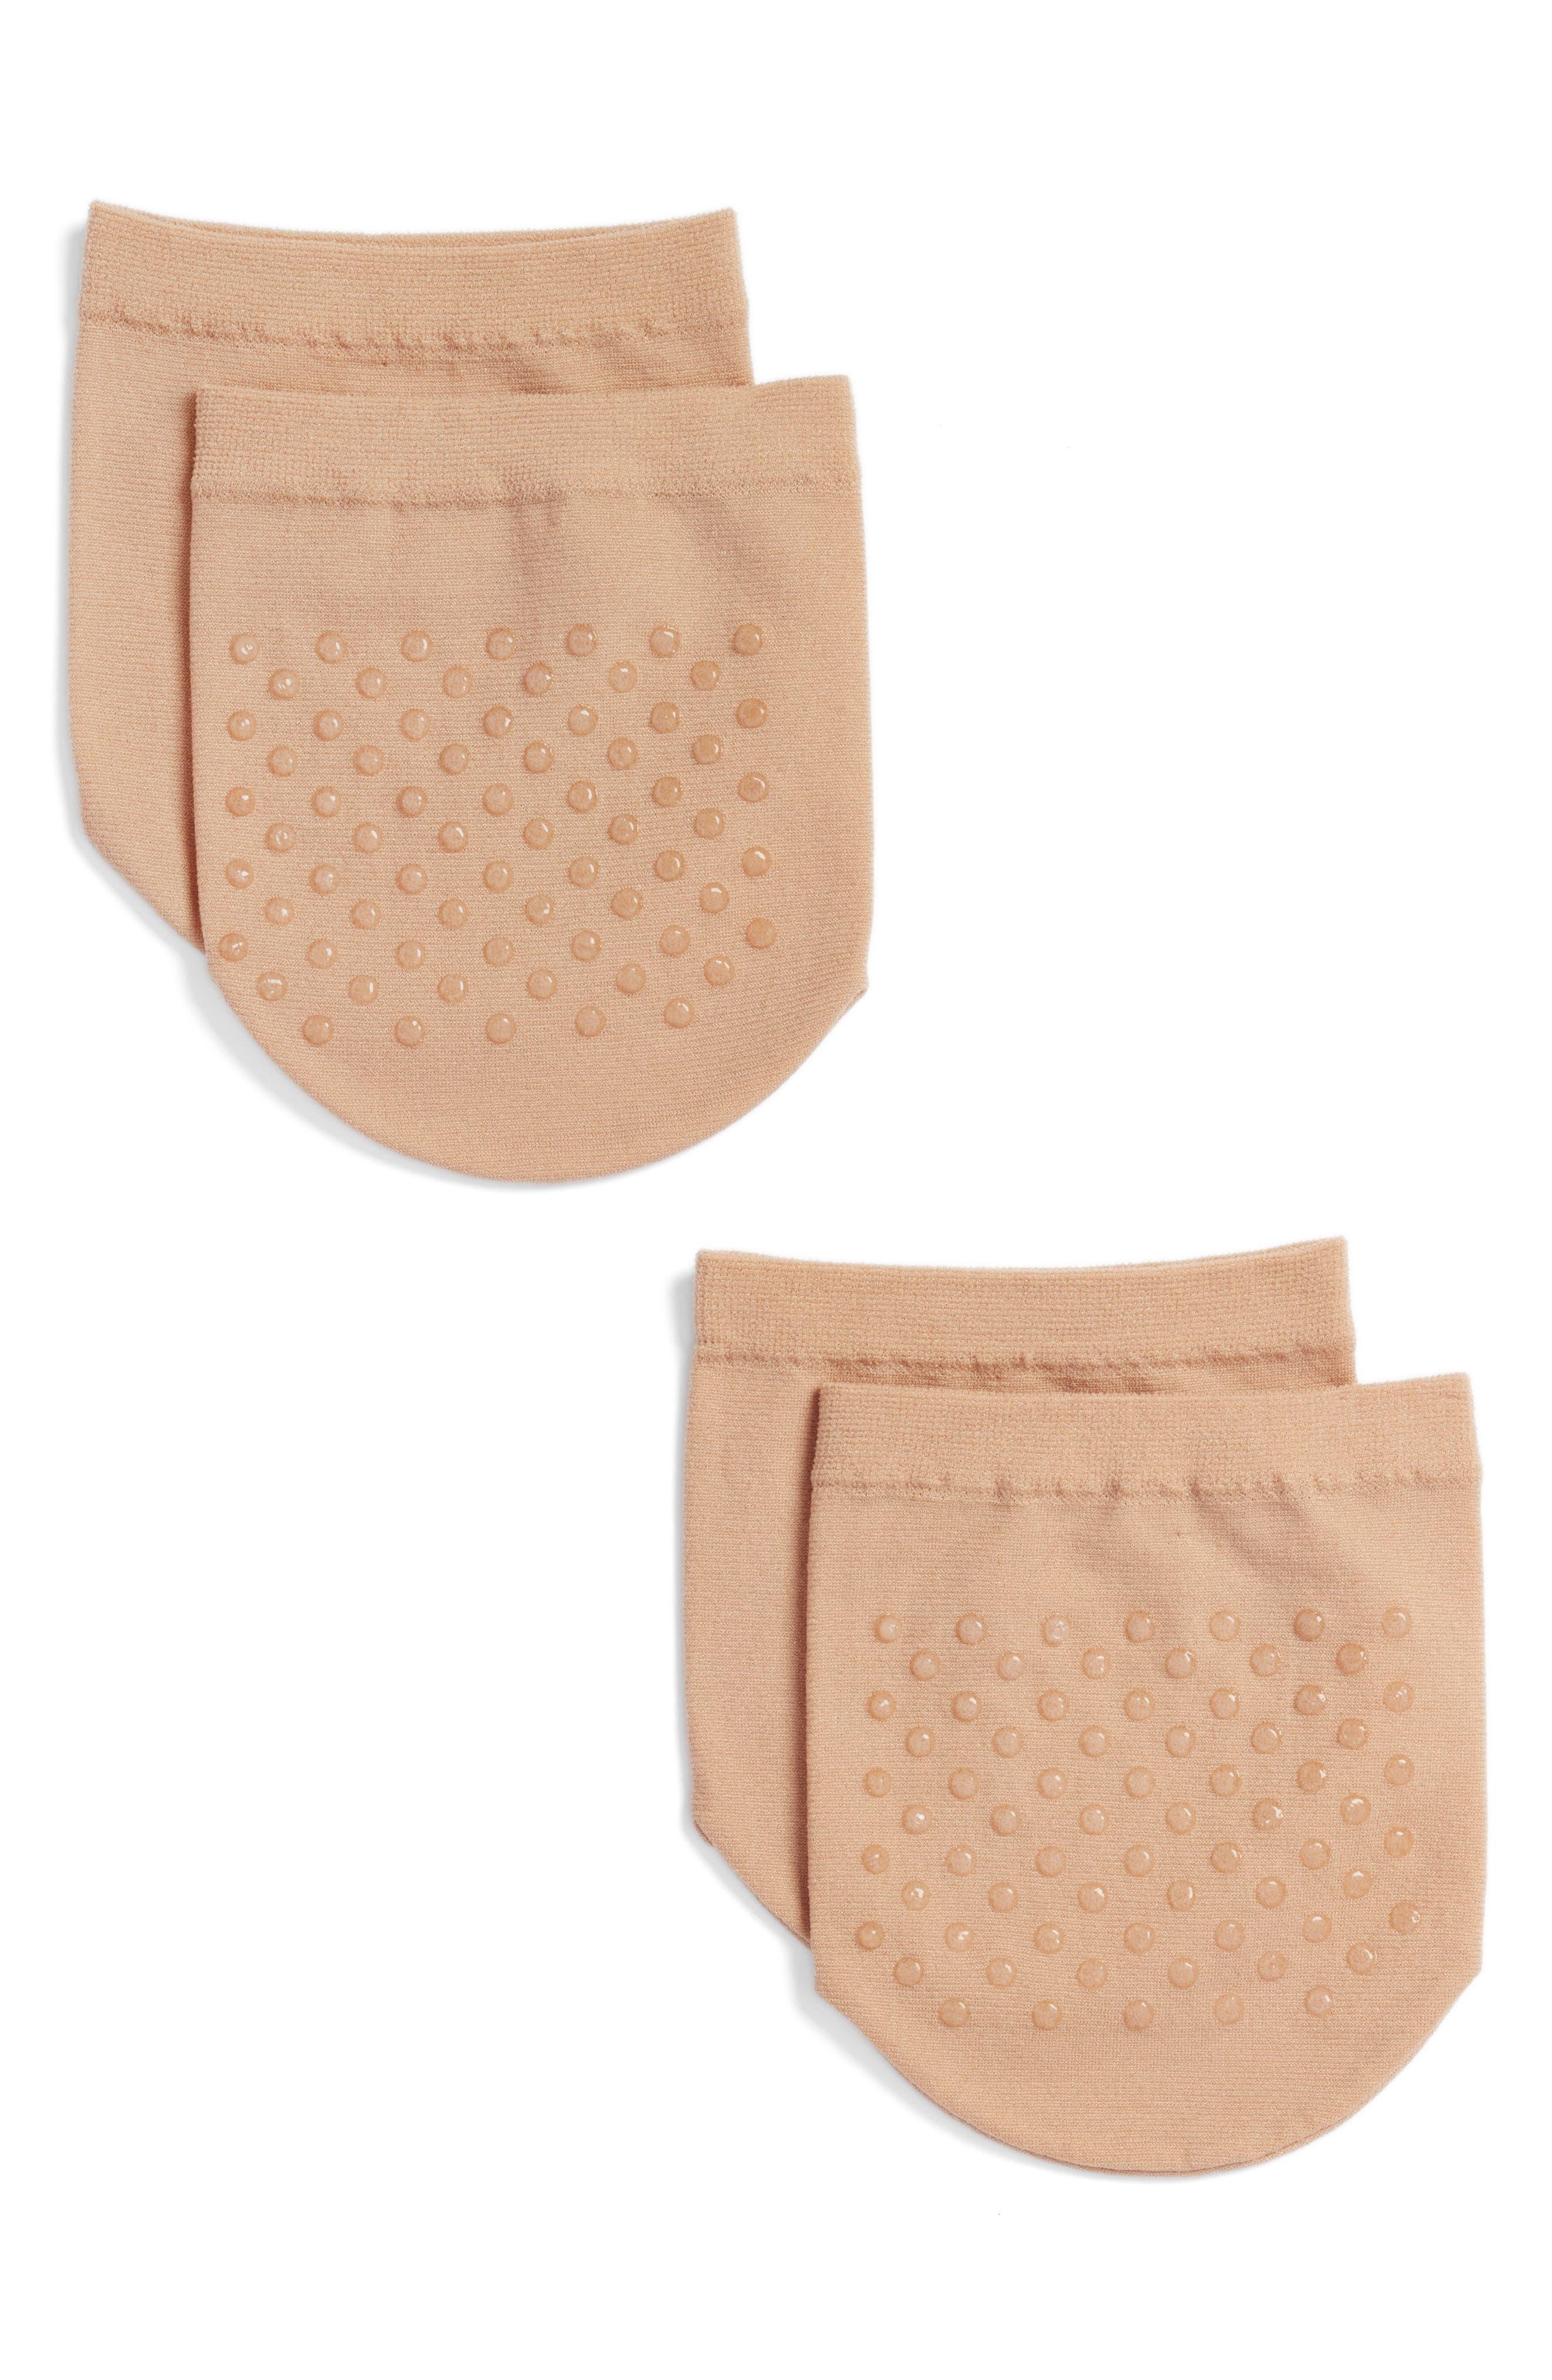 SOCKART 2-Pack Gripper Mule Socks